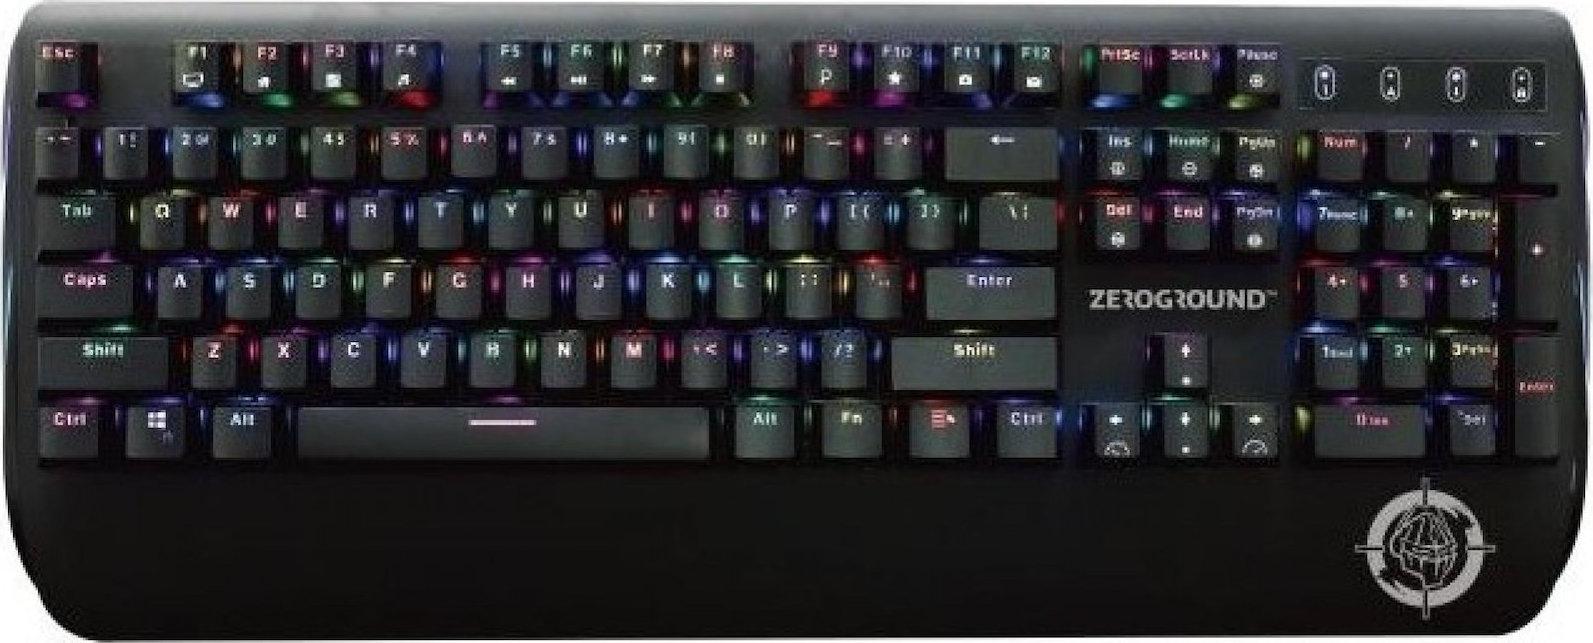 Zeroground KB-2700G Sakimo Μηχανικό Πληκτρολόγιο Gaming